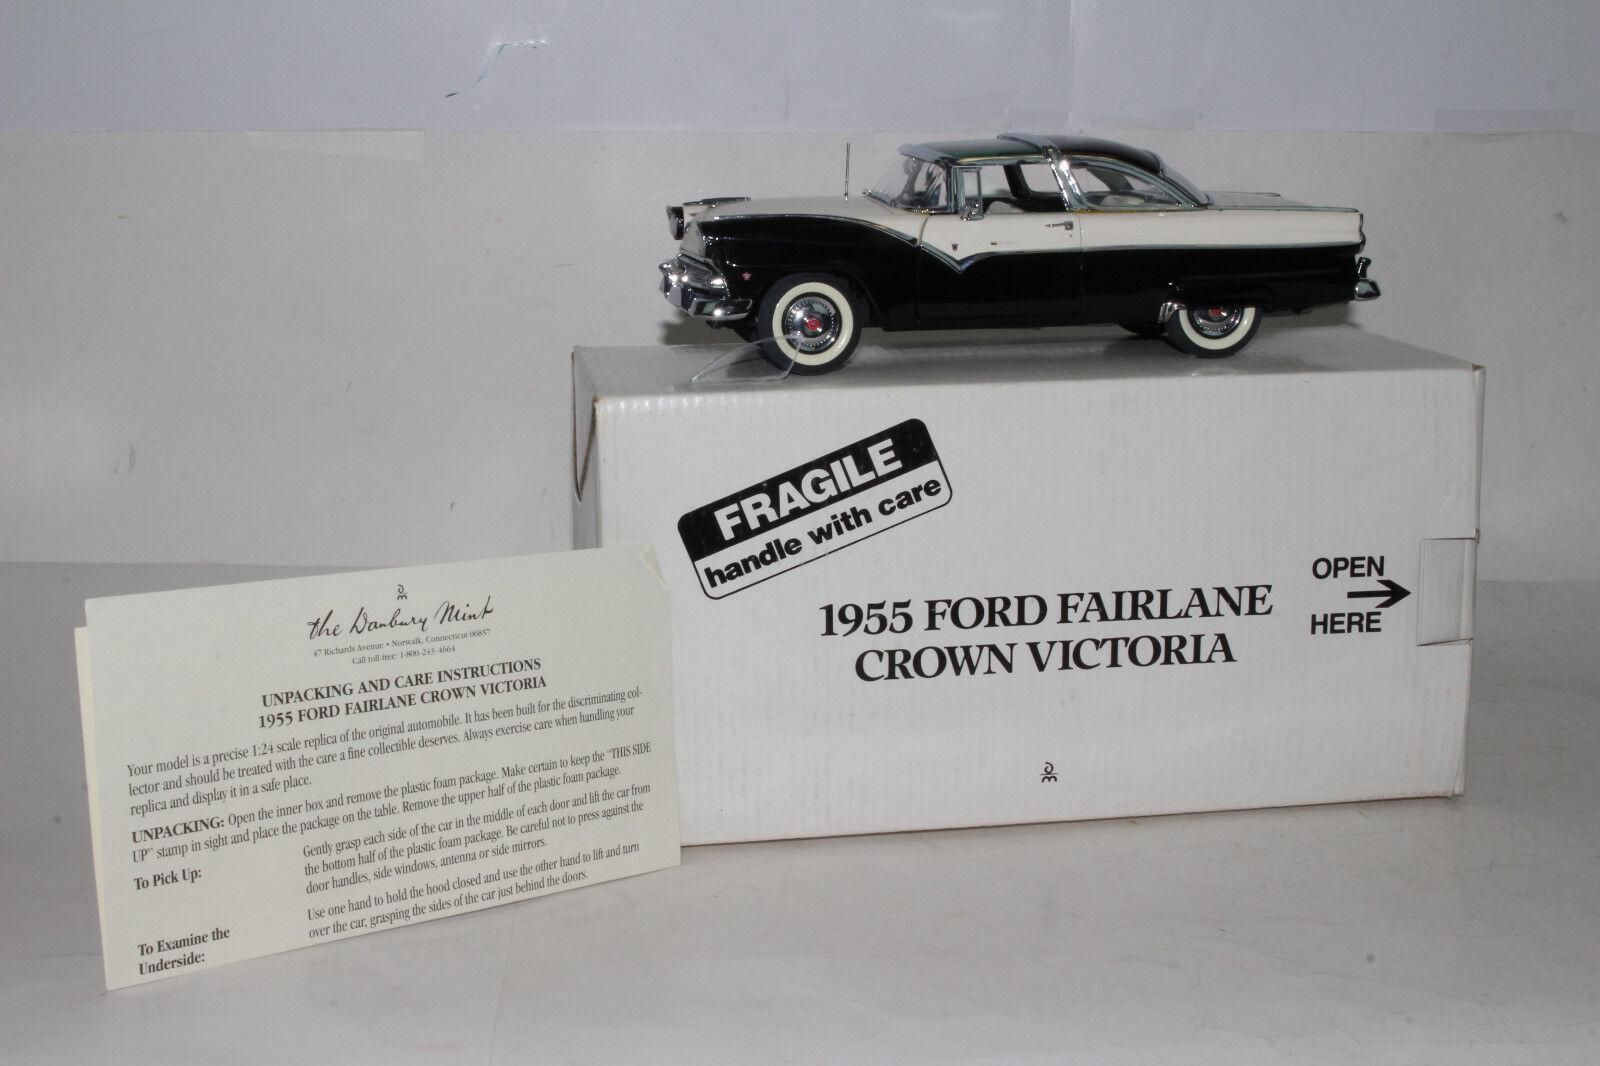 Danbury Mint 1955 Ford Fairlane Crown Victoria, negro & blanco, 1 24 , en Caja